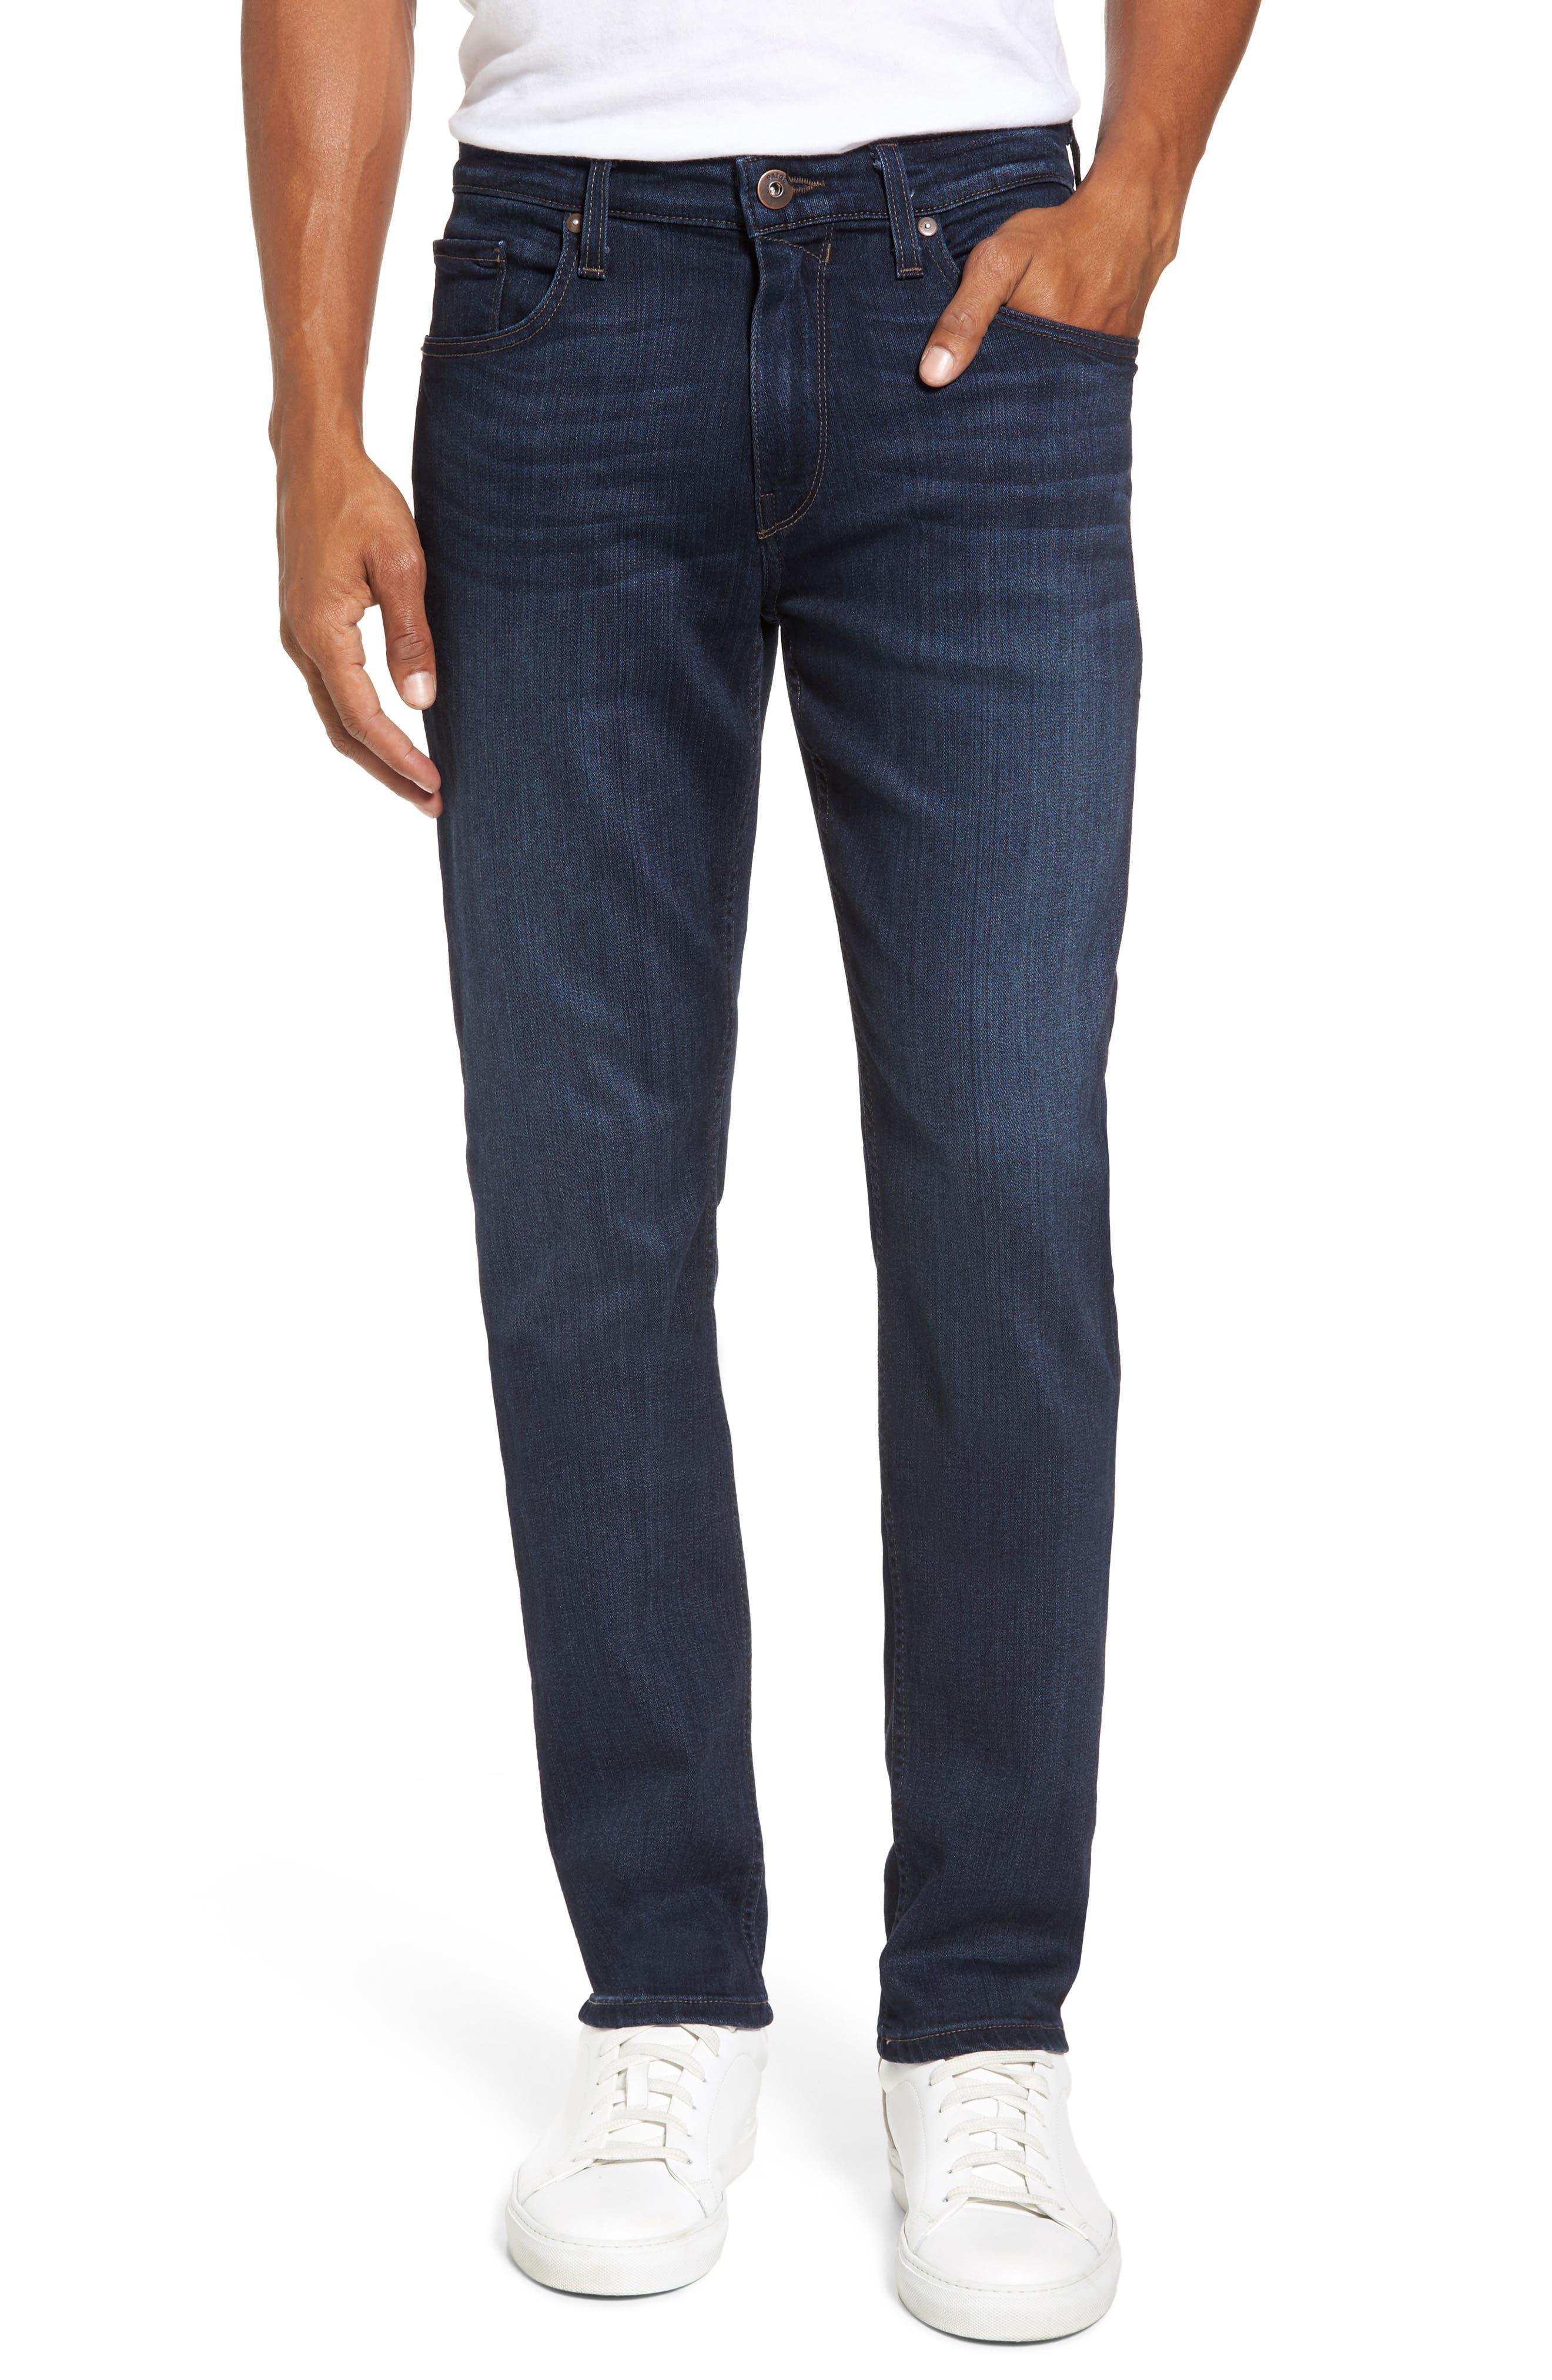 Transcend - Federal Slim Straight Leg Jeans,                             Main thumbnail 1, color,                             Barron